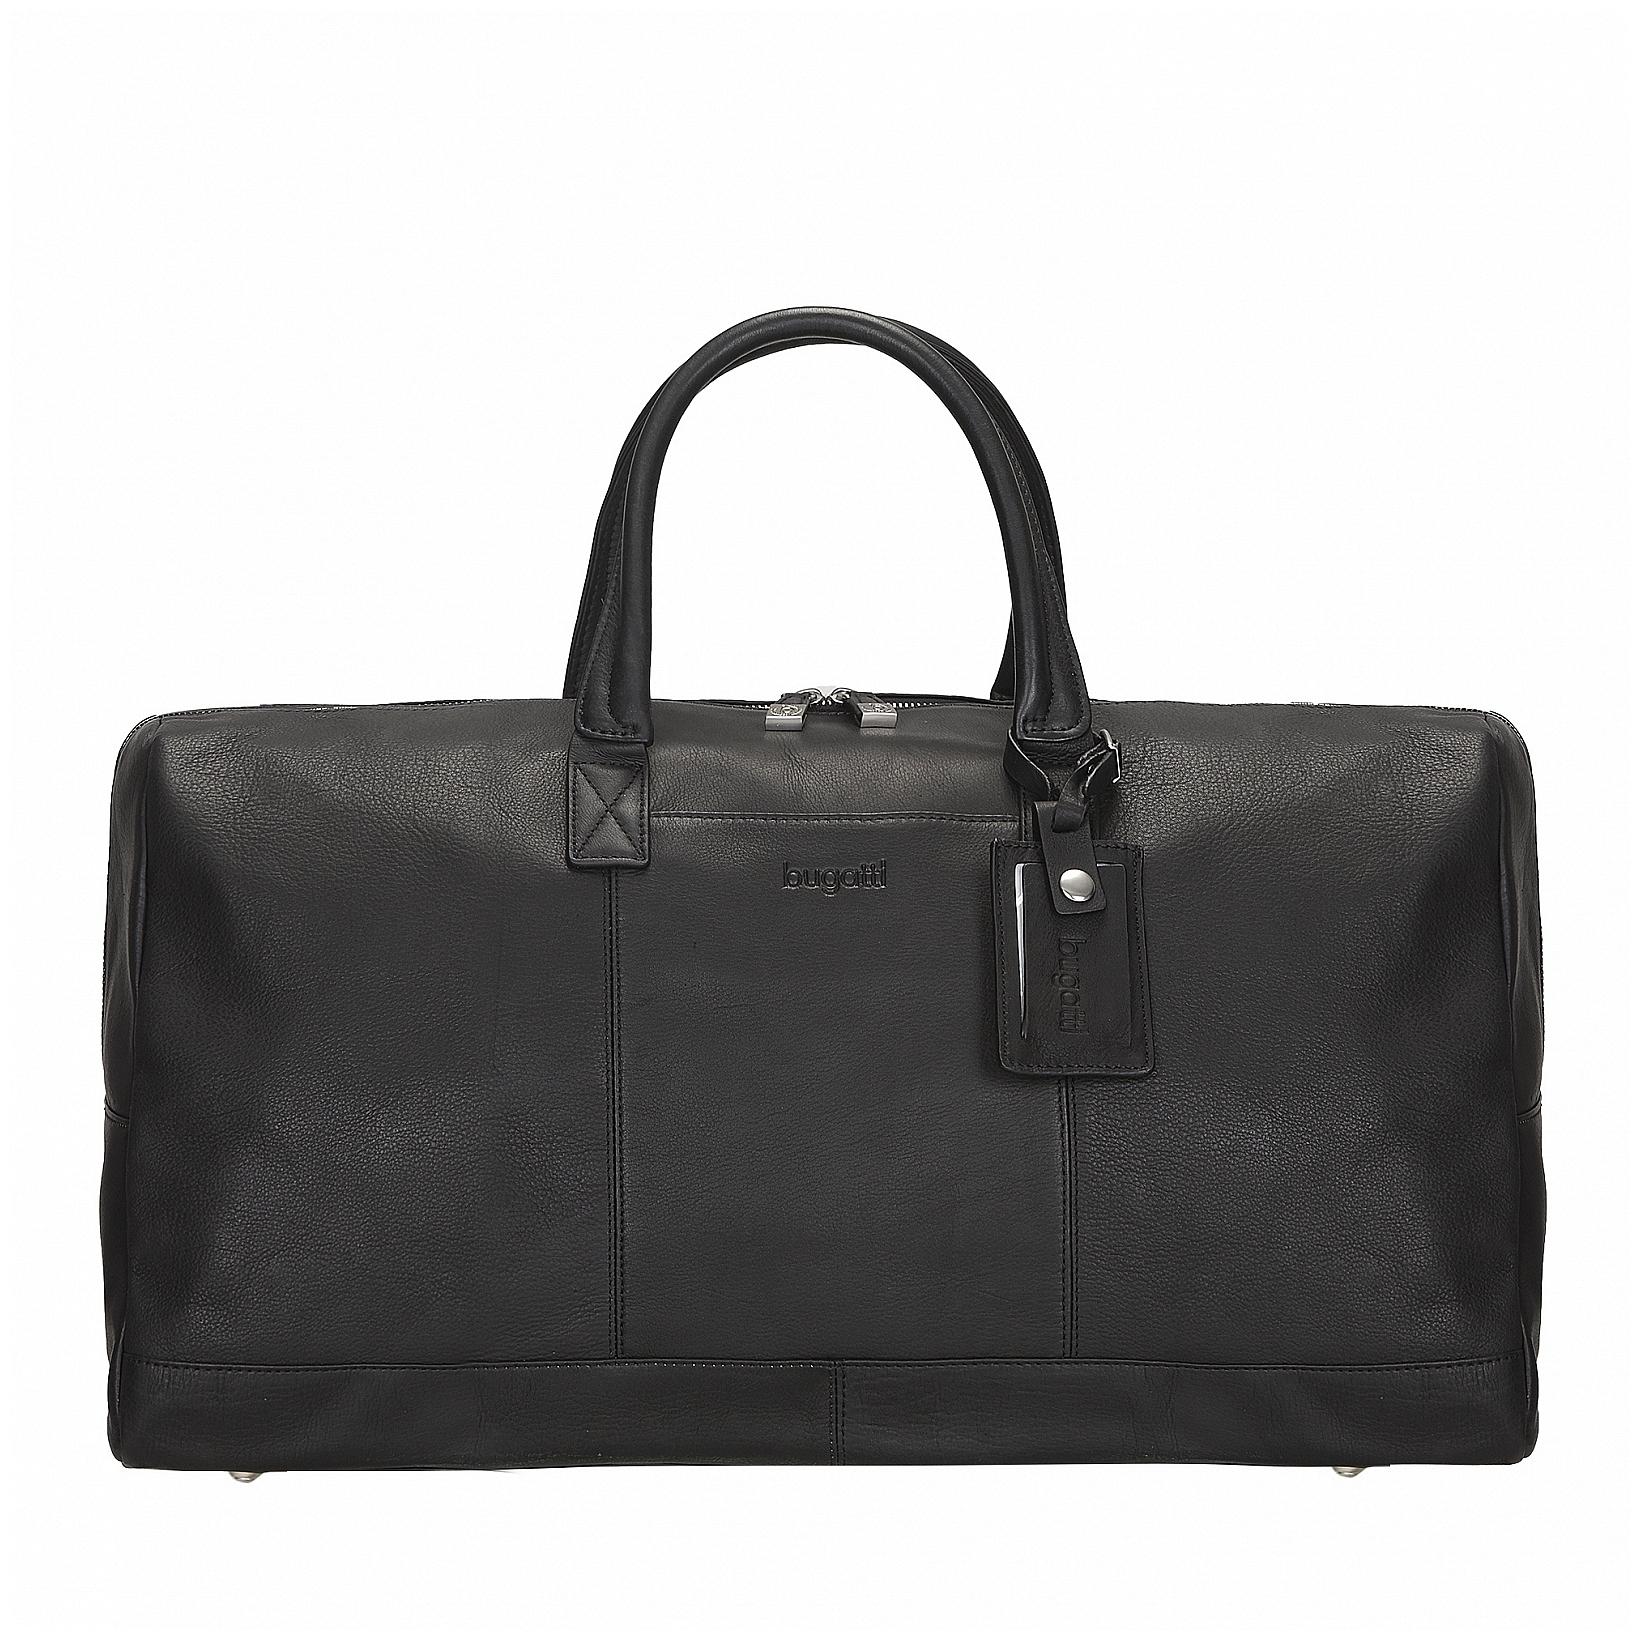 Bugatti Kožená cestovní taška SARTORIA 49546501 černá